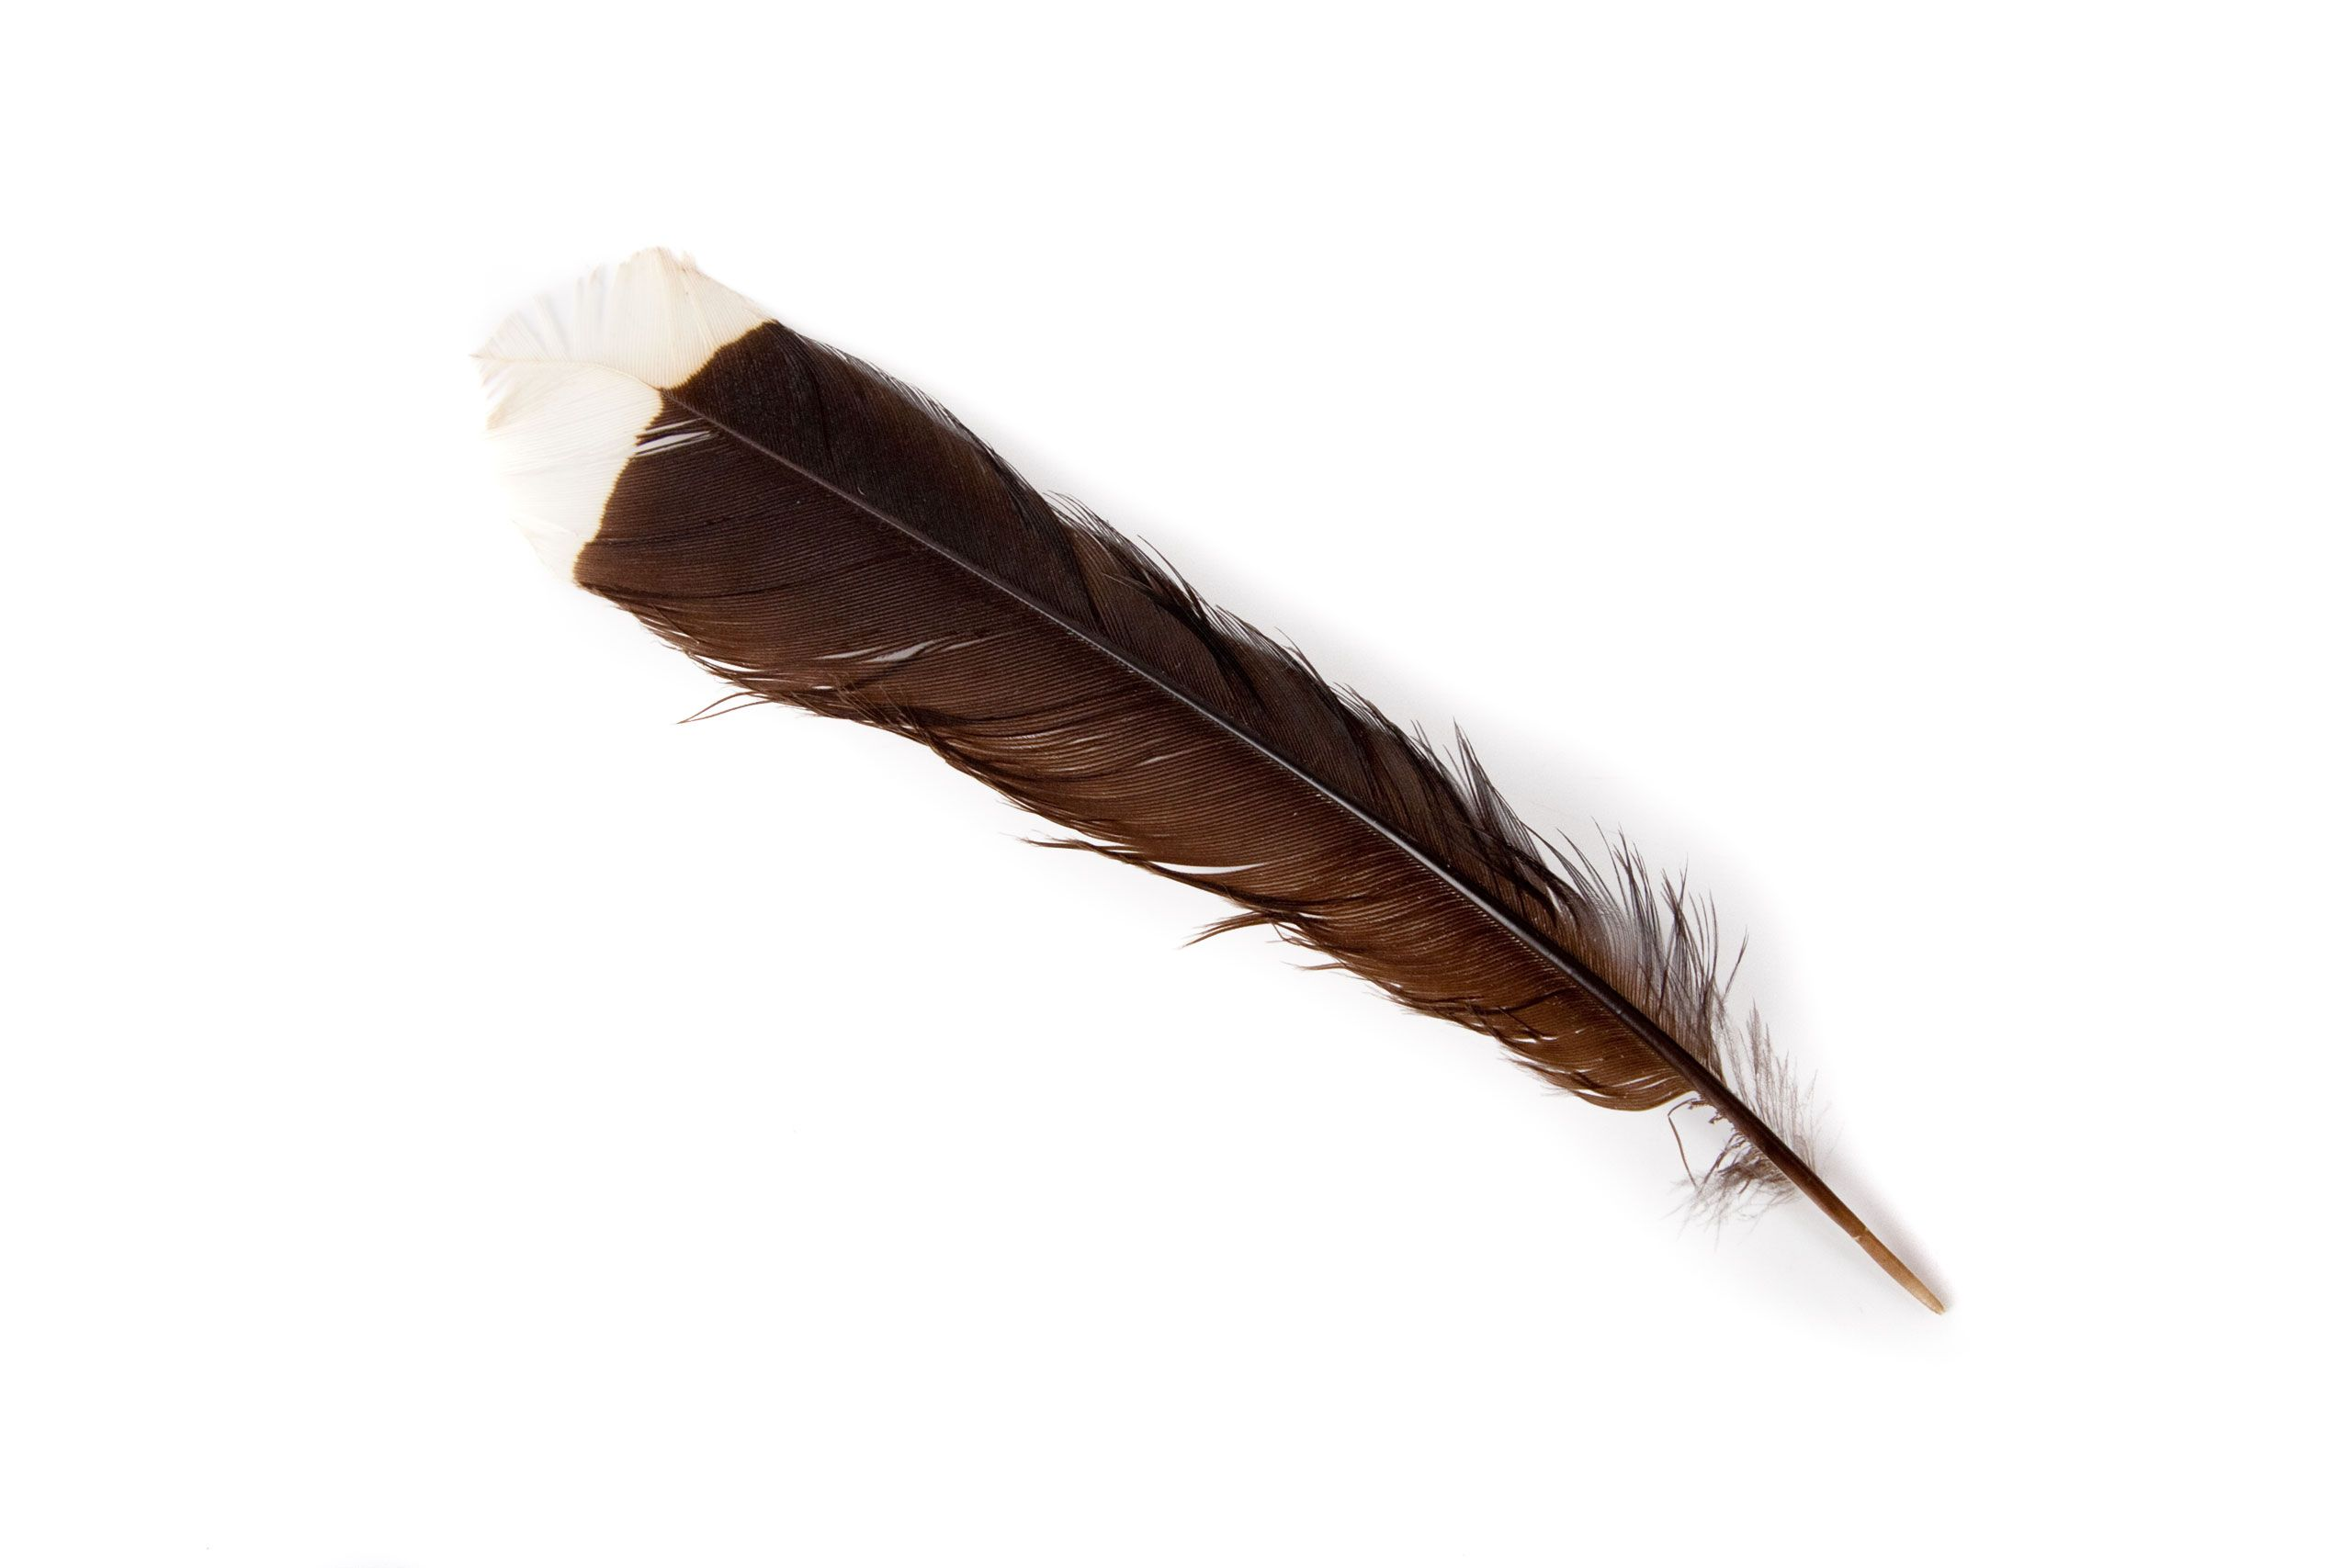 Feather of a Huia bird